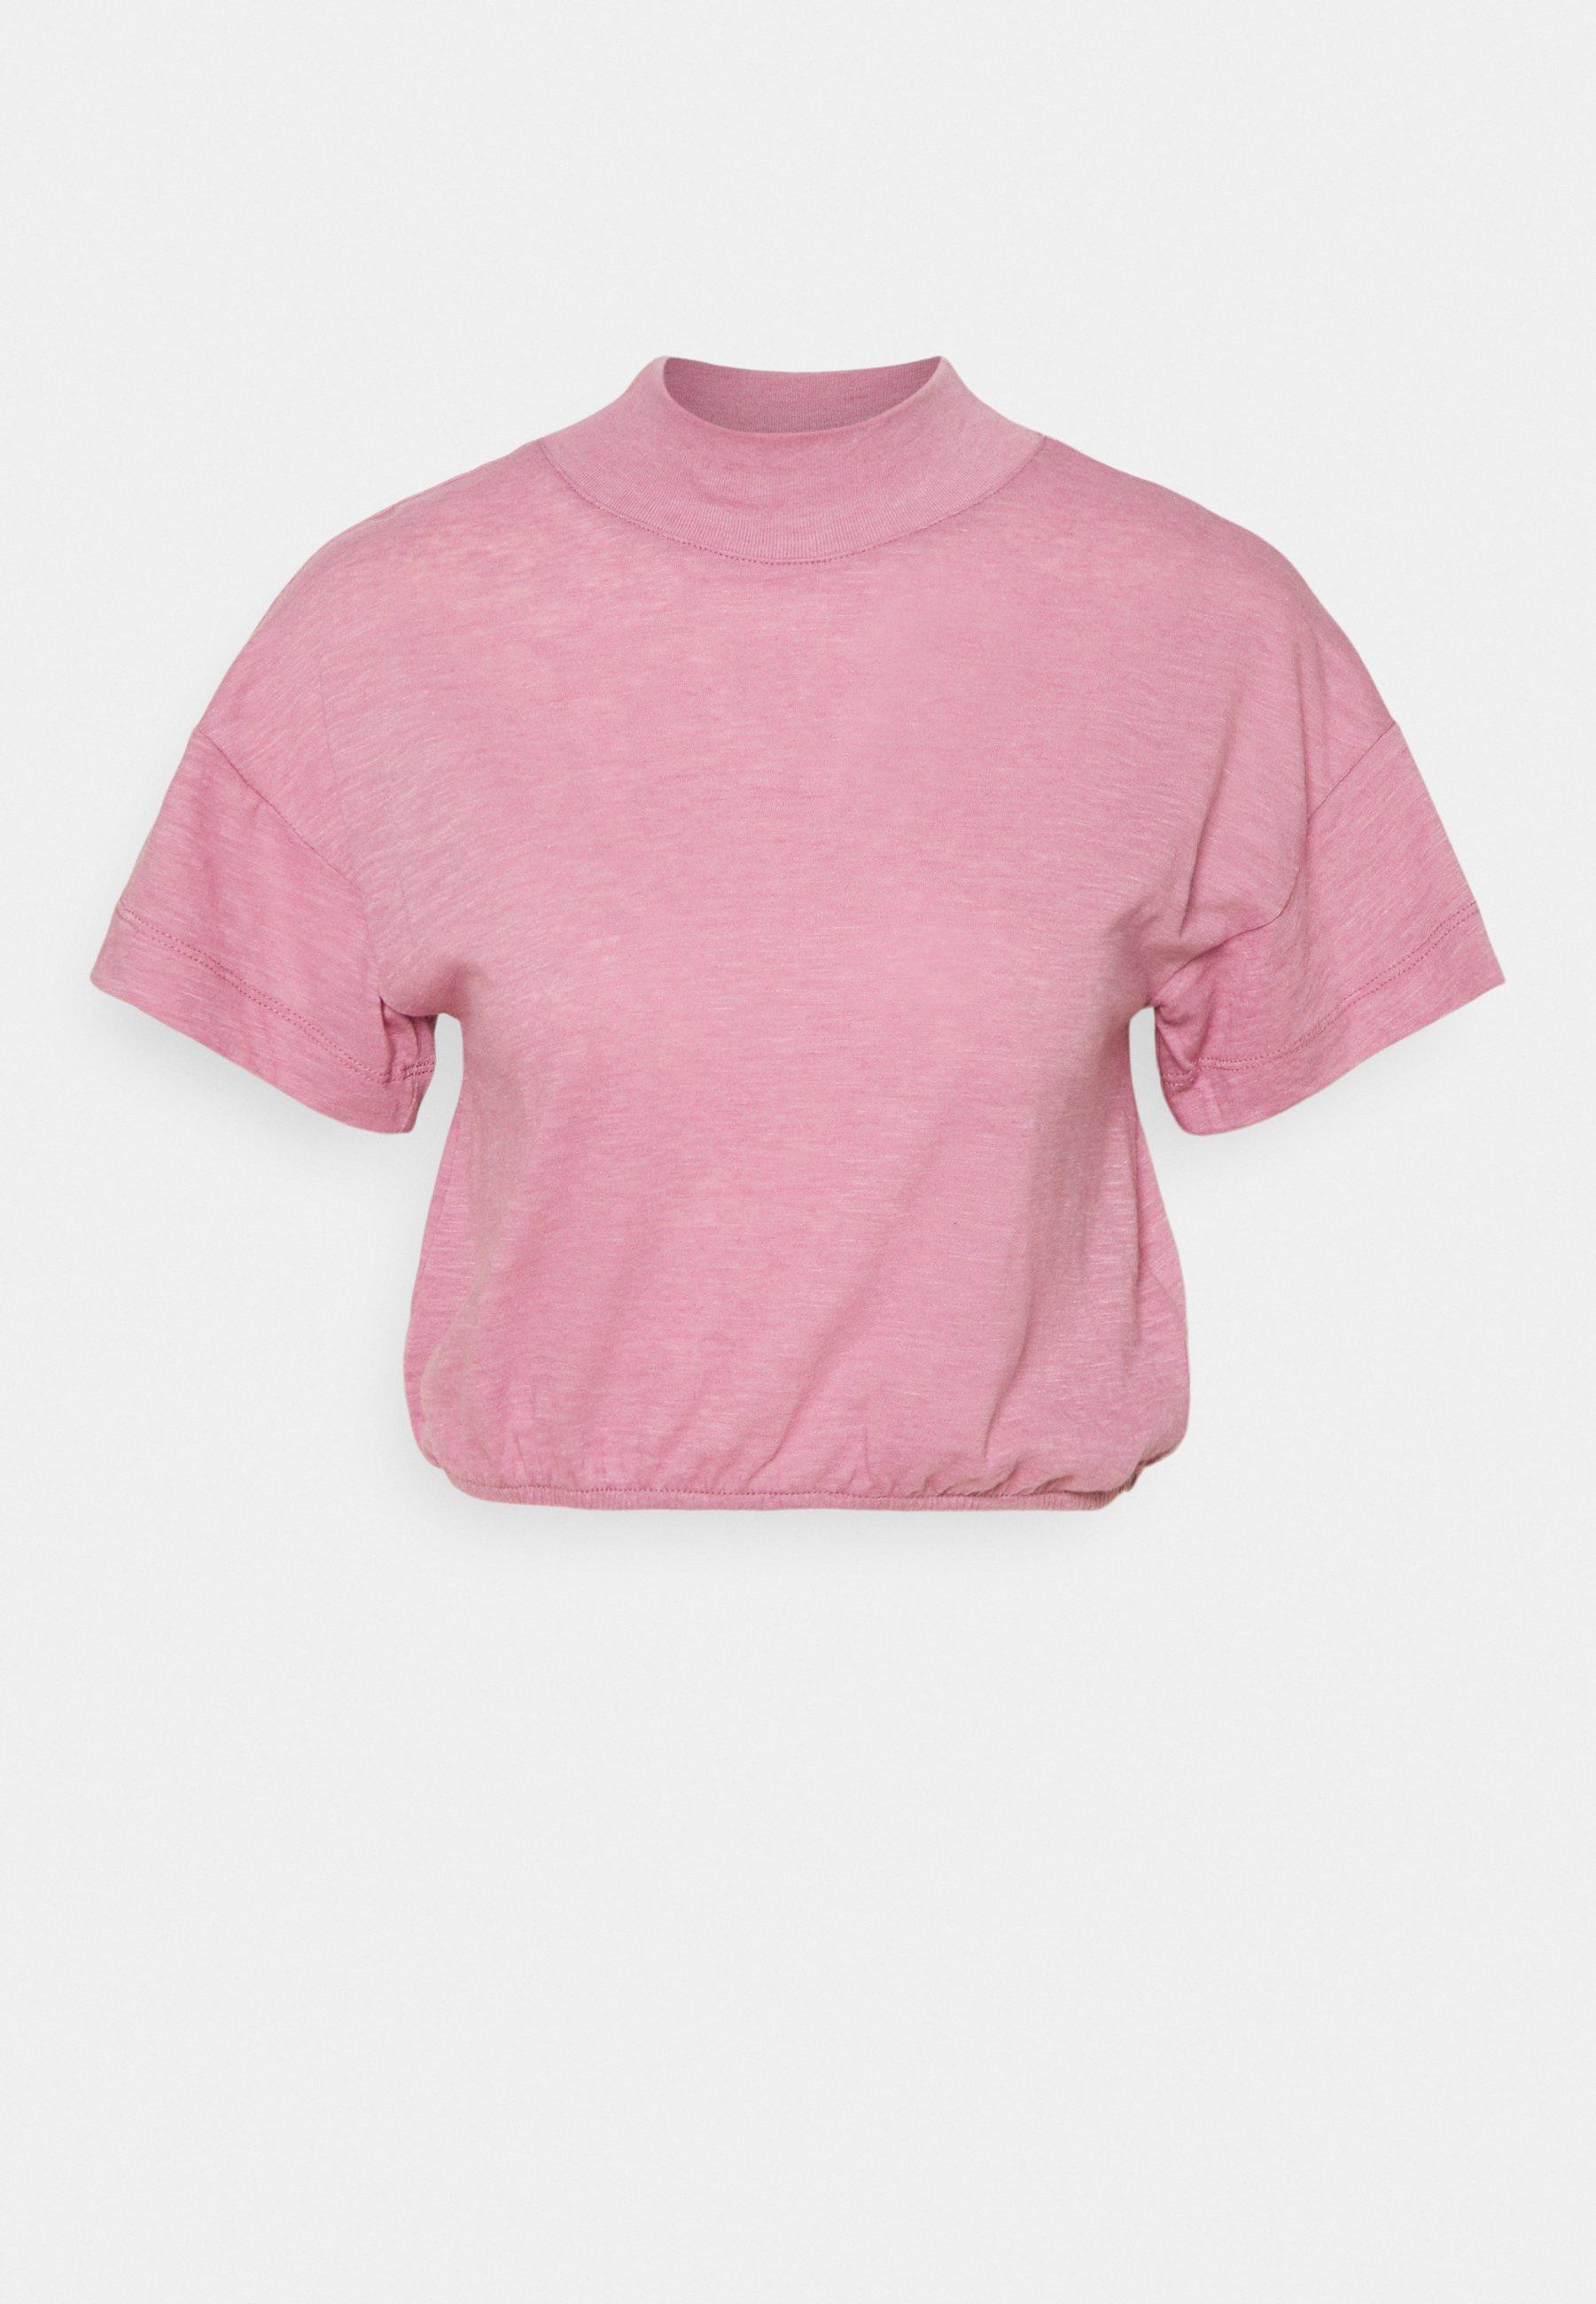 Femme LIFESTYLE MOCK NECK - T-shirt basique